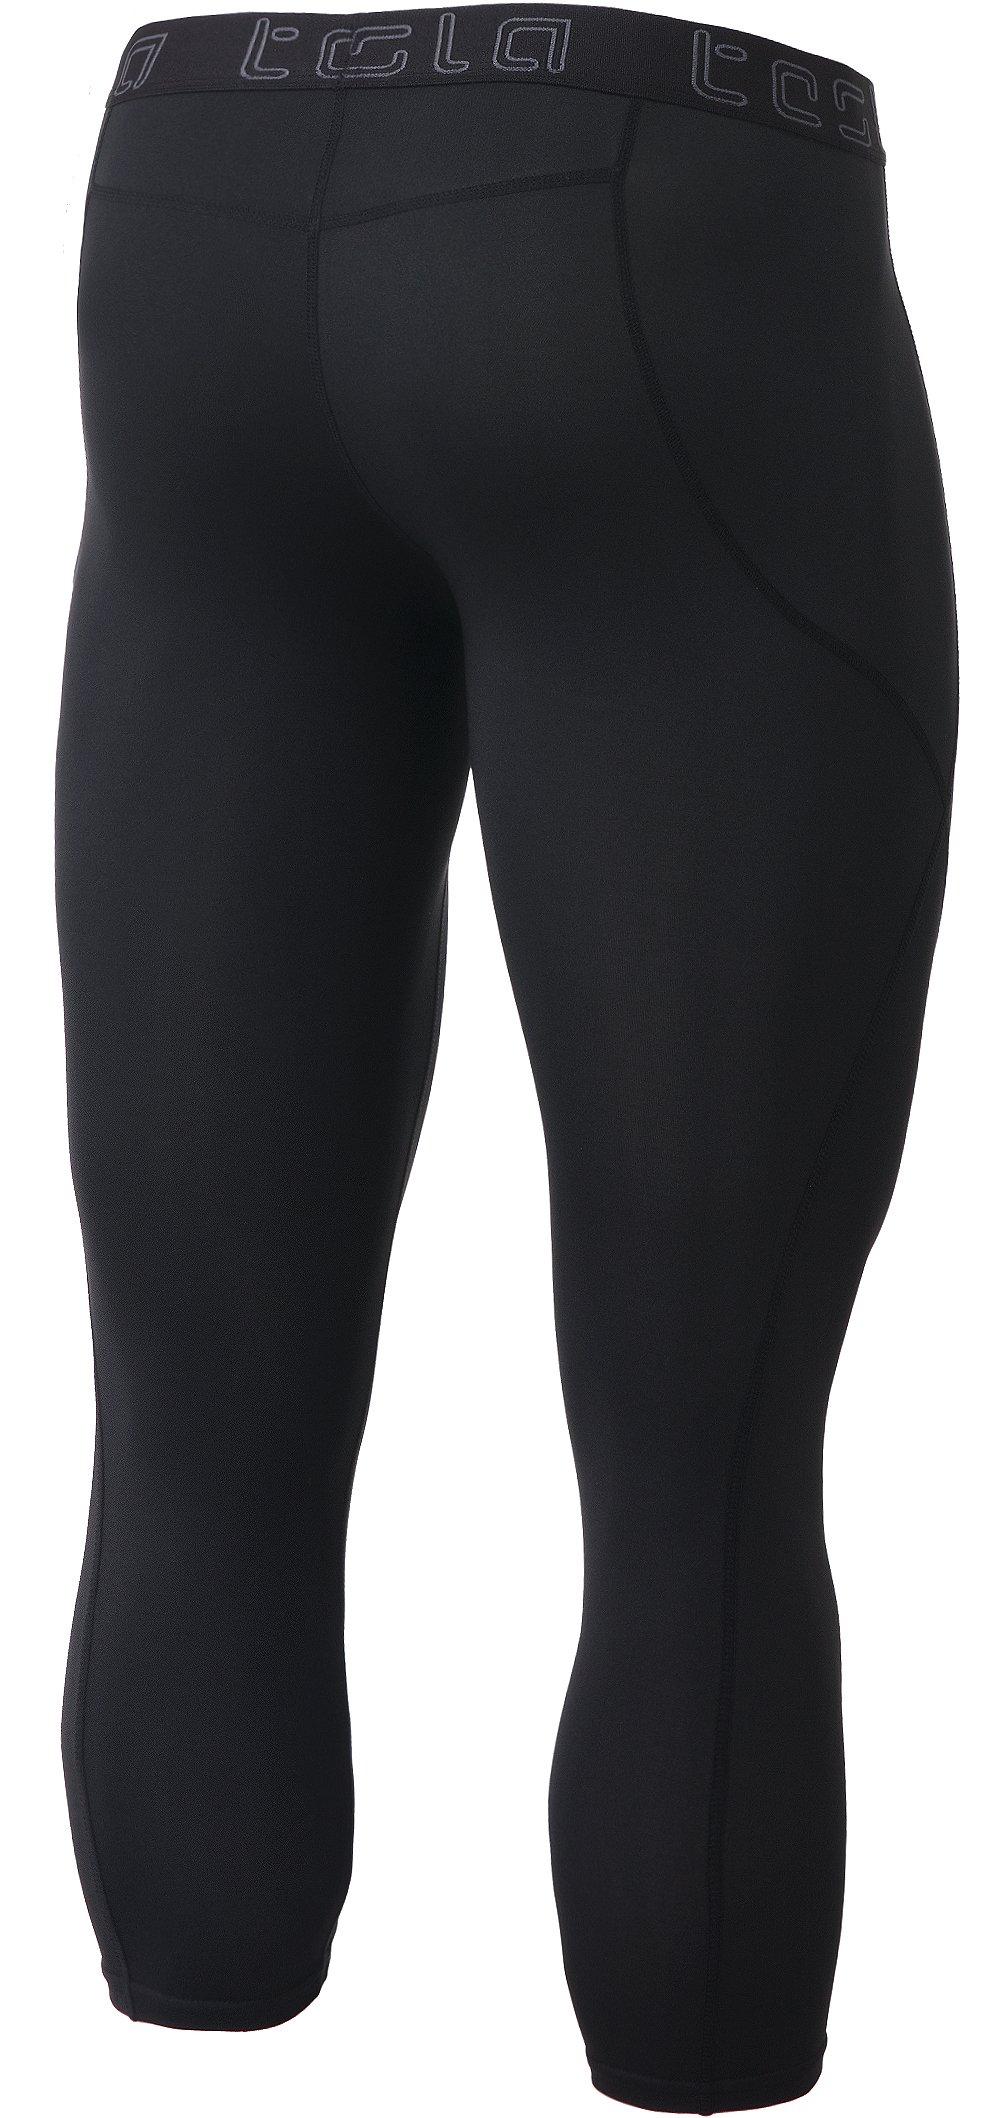 TM-MUC18-KLB_X-Small Tesla Men's Compression Capri Shorts Baselayer Cool Dry Sports Tights MUC18 by TSLA (Image #2)